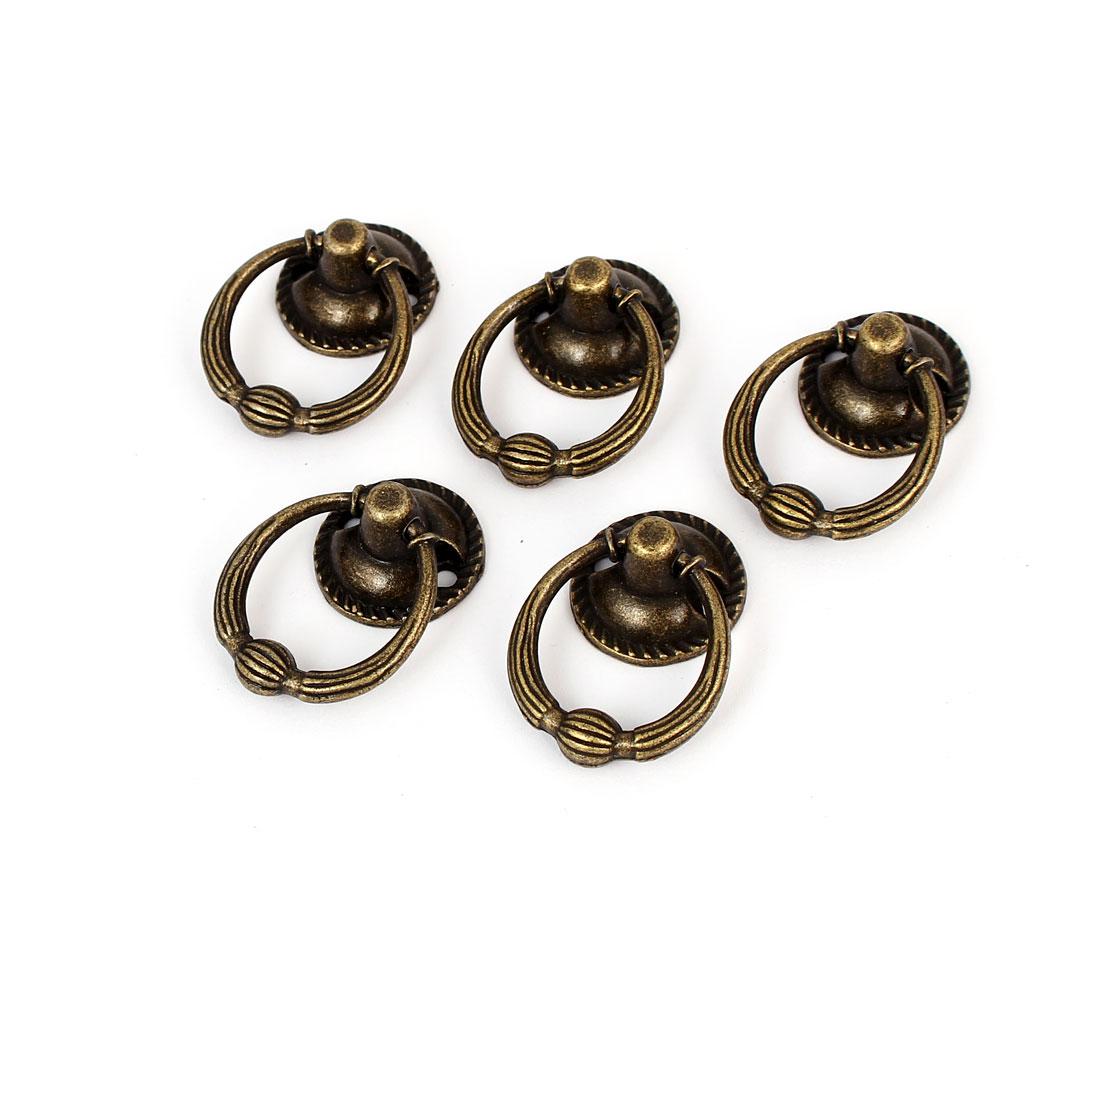 20mm Ring Dia Zinc Alloy Retro Style Round Base Pull Handle Bronze Tone 5pcs